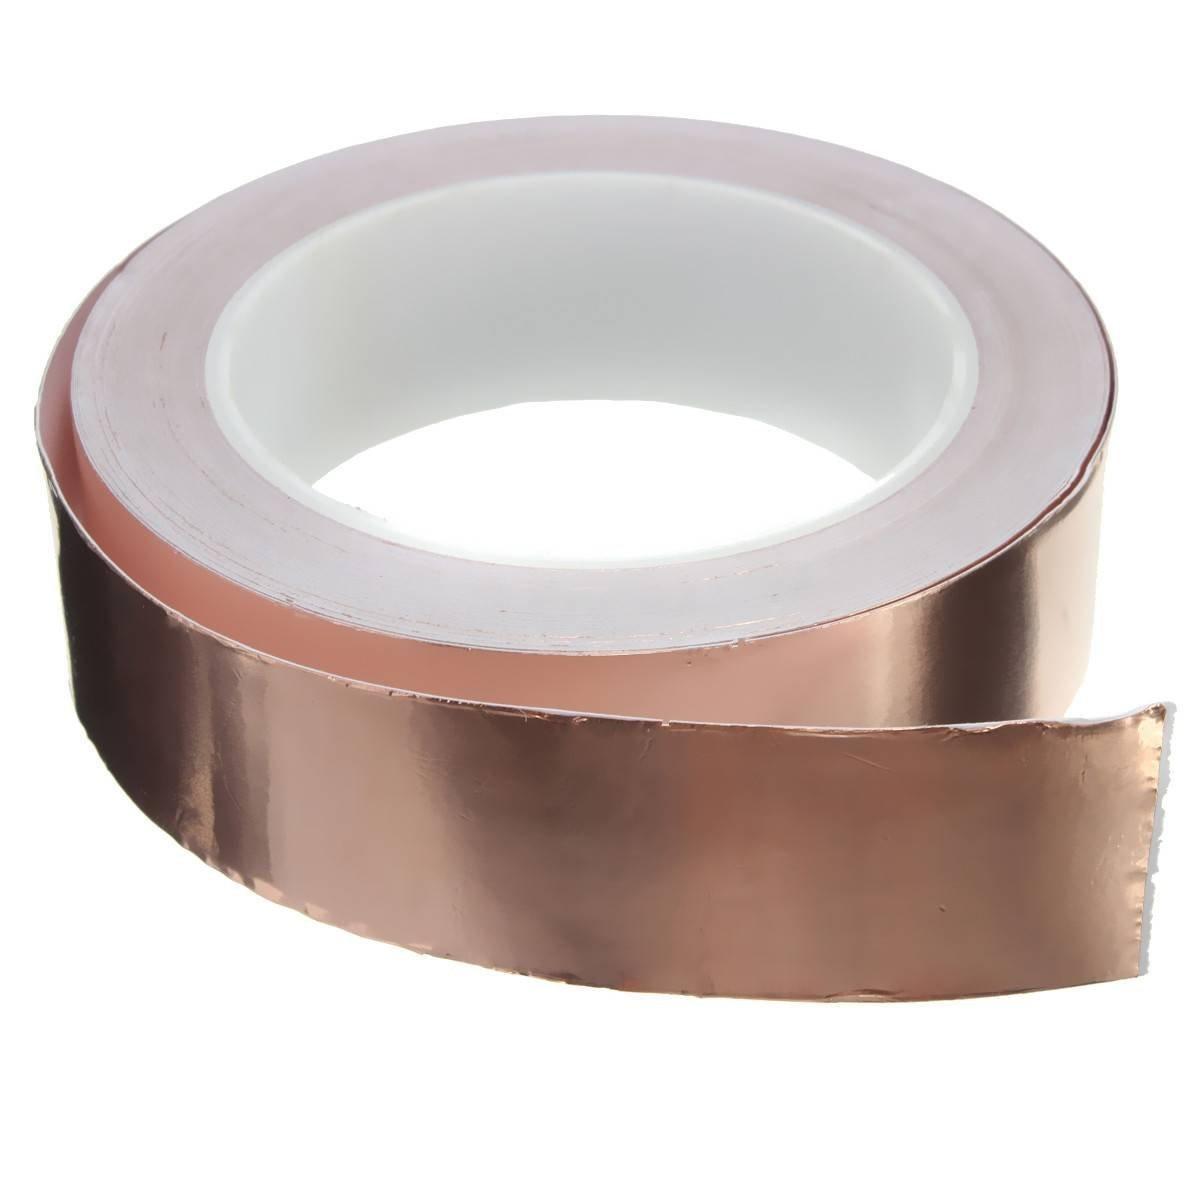 Mackur Copper Foil Tape for EMI Shielding Tape Copper Tape Self-adhesive Tape 1PCS size 20mm*20m #1